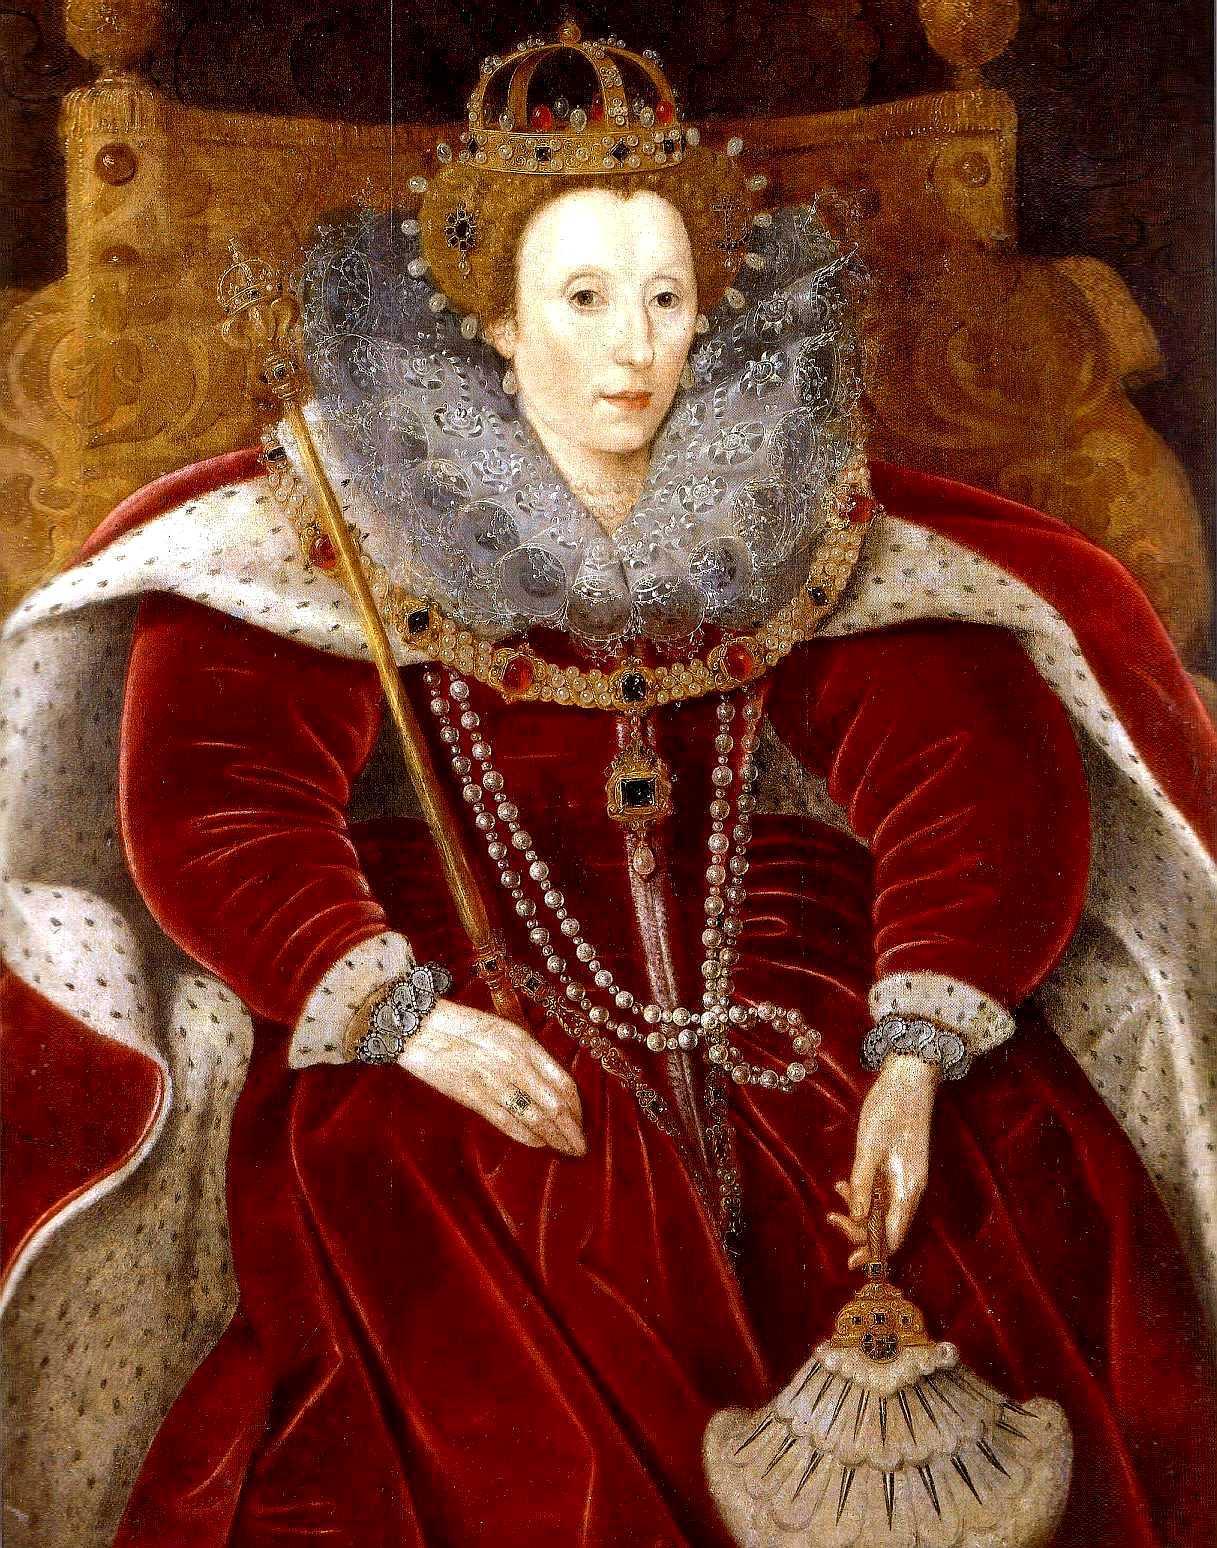 http://www.naergilien.info/research/Portraits/Elizabeth/gloriana1.jpg